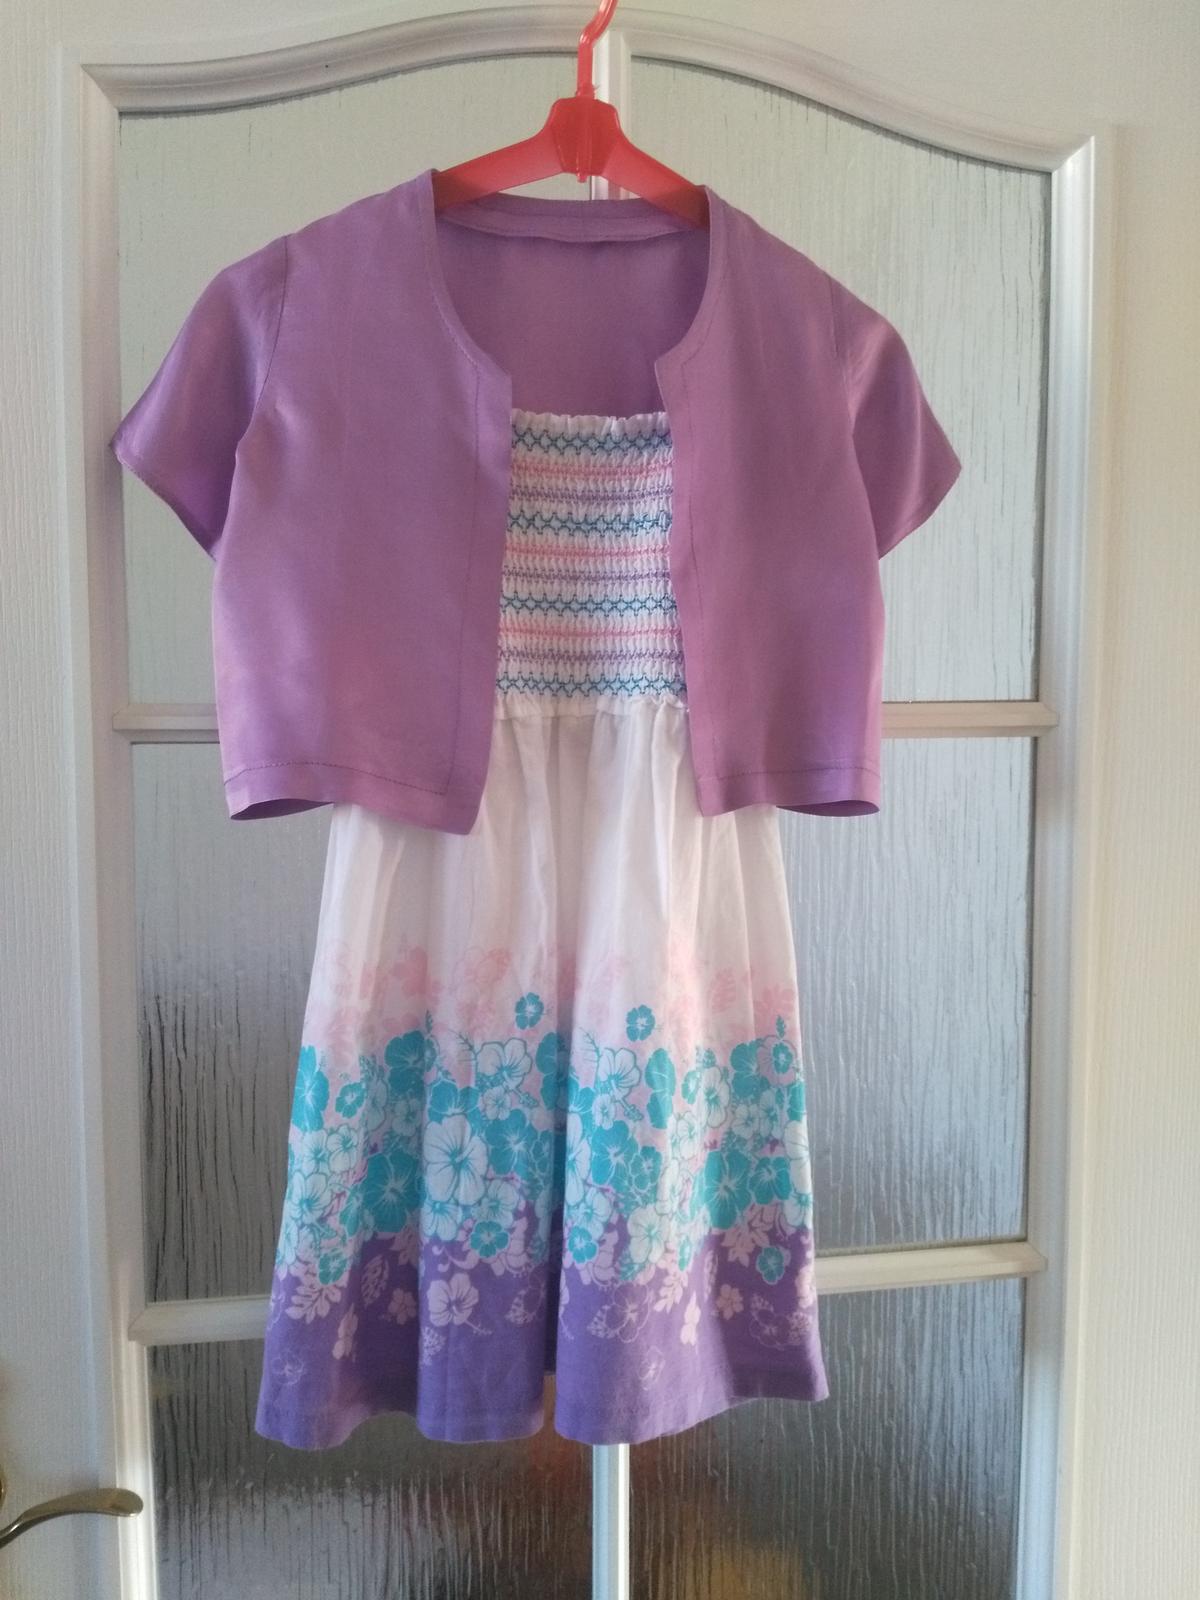 Šaty s bolerkem vel. 6-7let - Obrázek č. 1